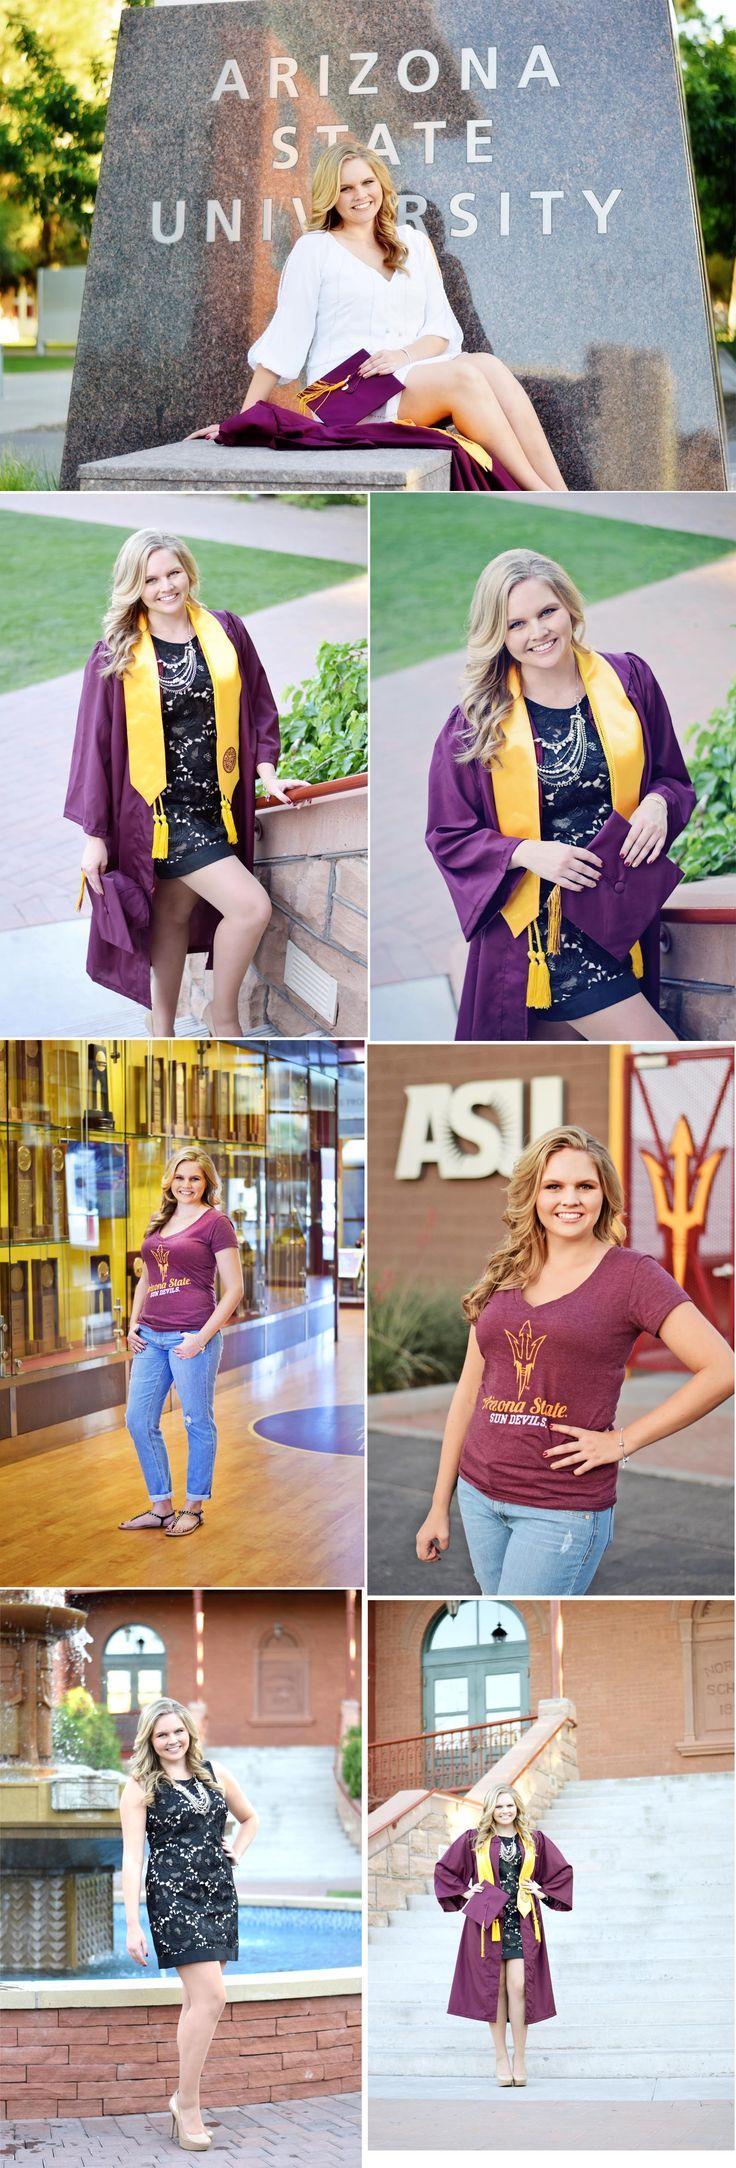 Senior portraits. Arizona State University. Photo poses.